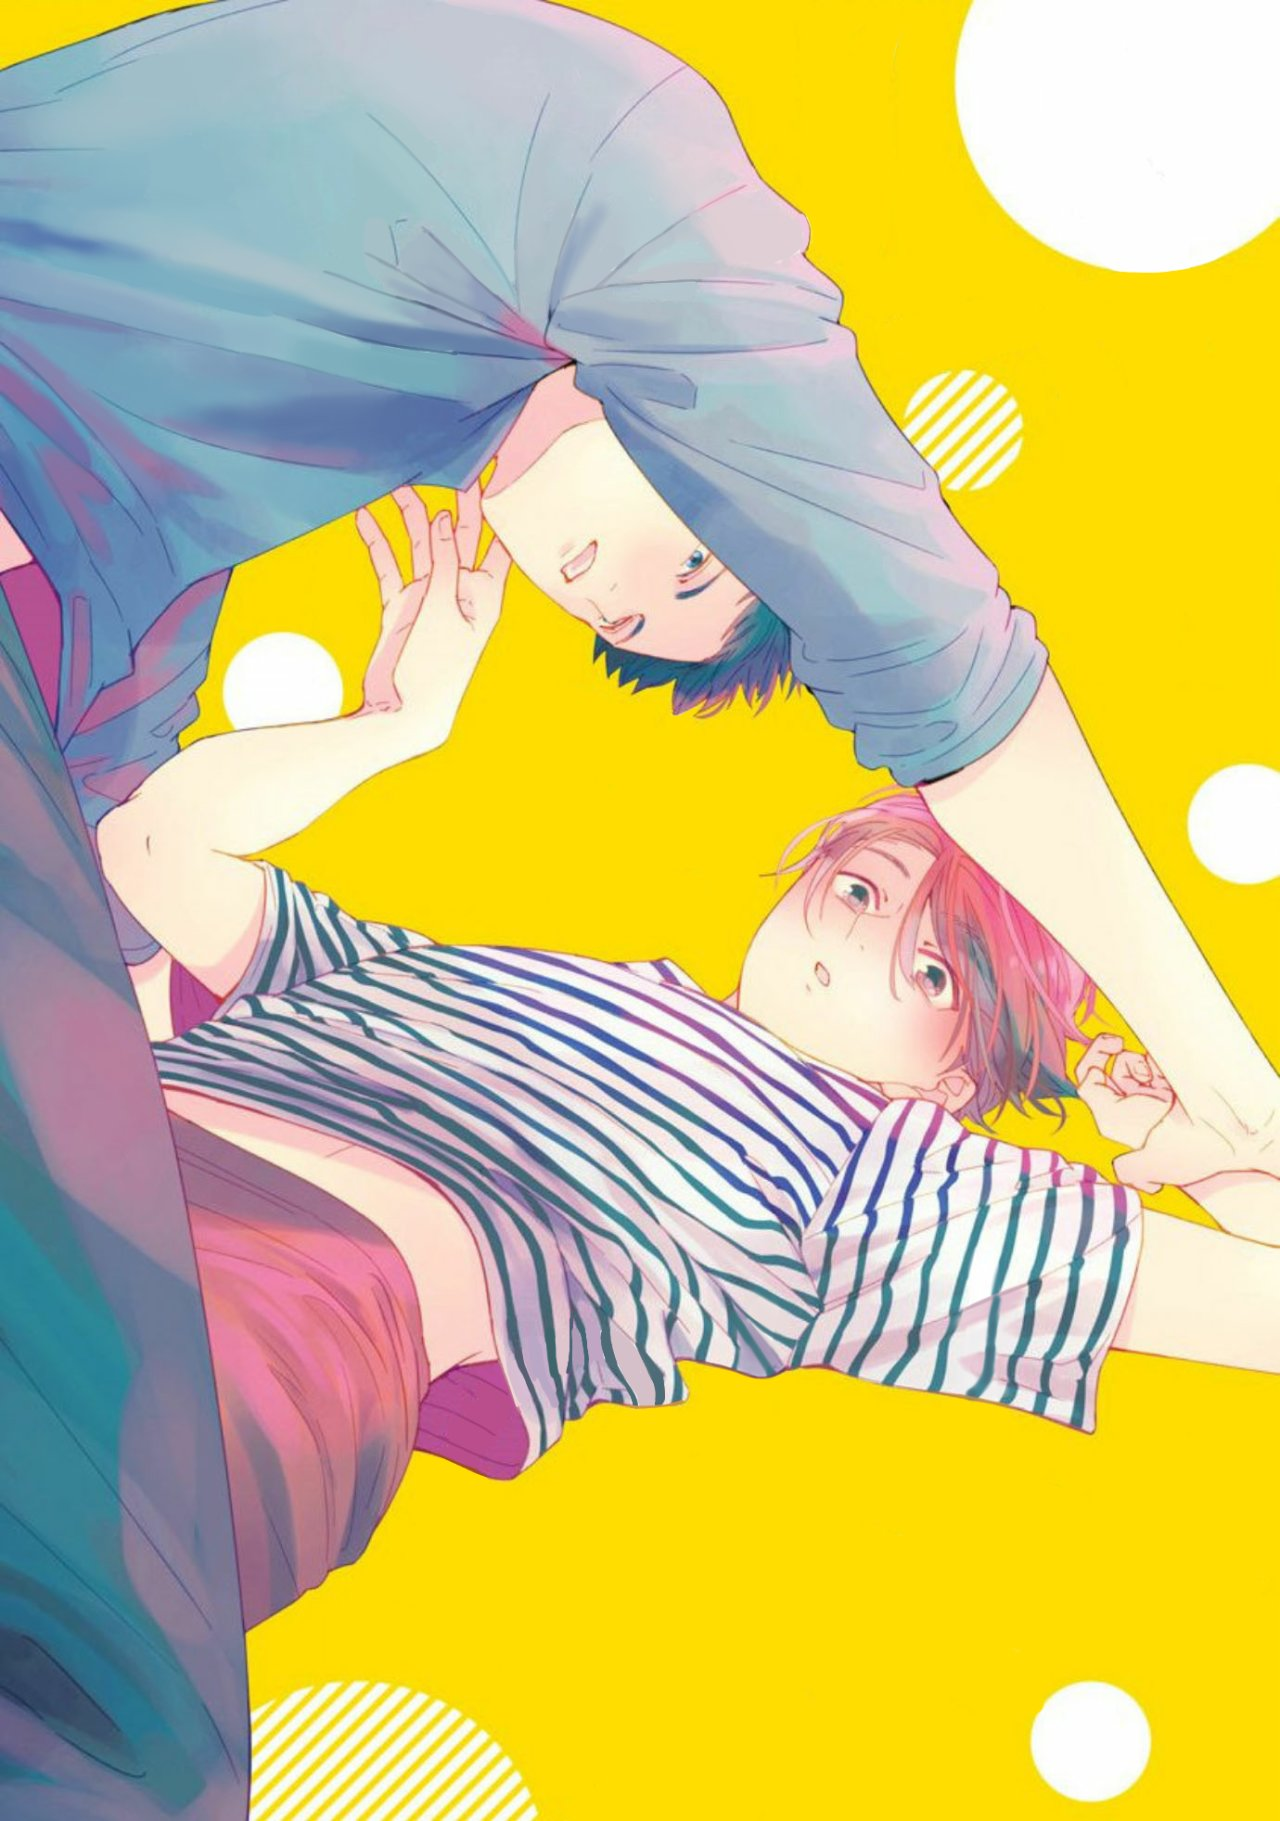 https://nine.mangadogs.com/es_manga/pic8/12/36684/946997/c48d1311c2171e1ce7651f458a815c9a.jpg Page 3